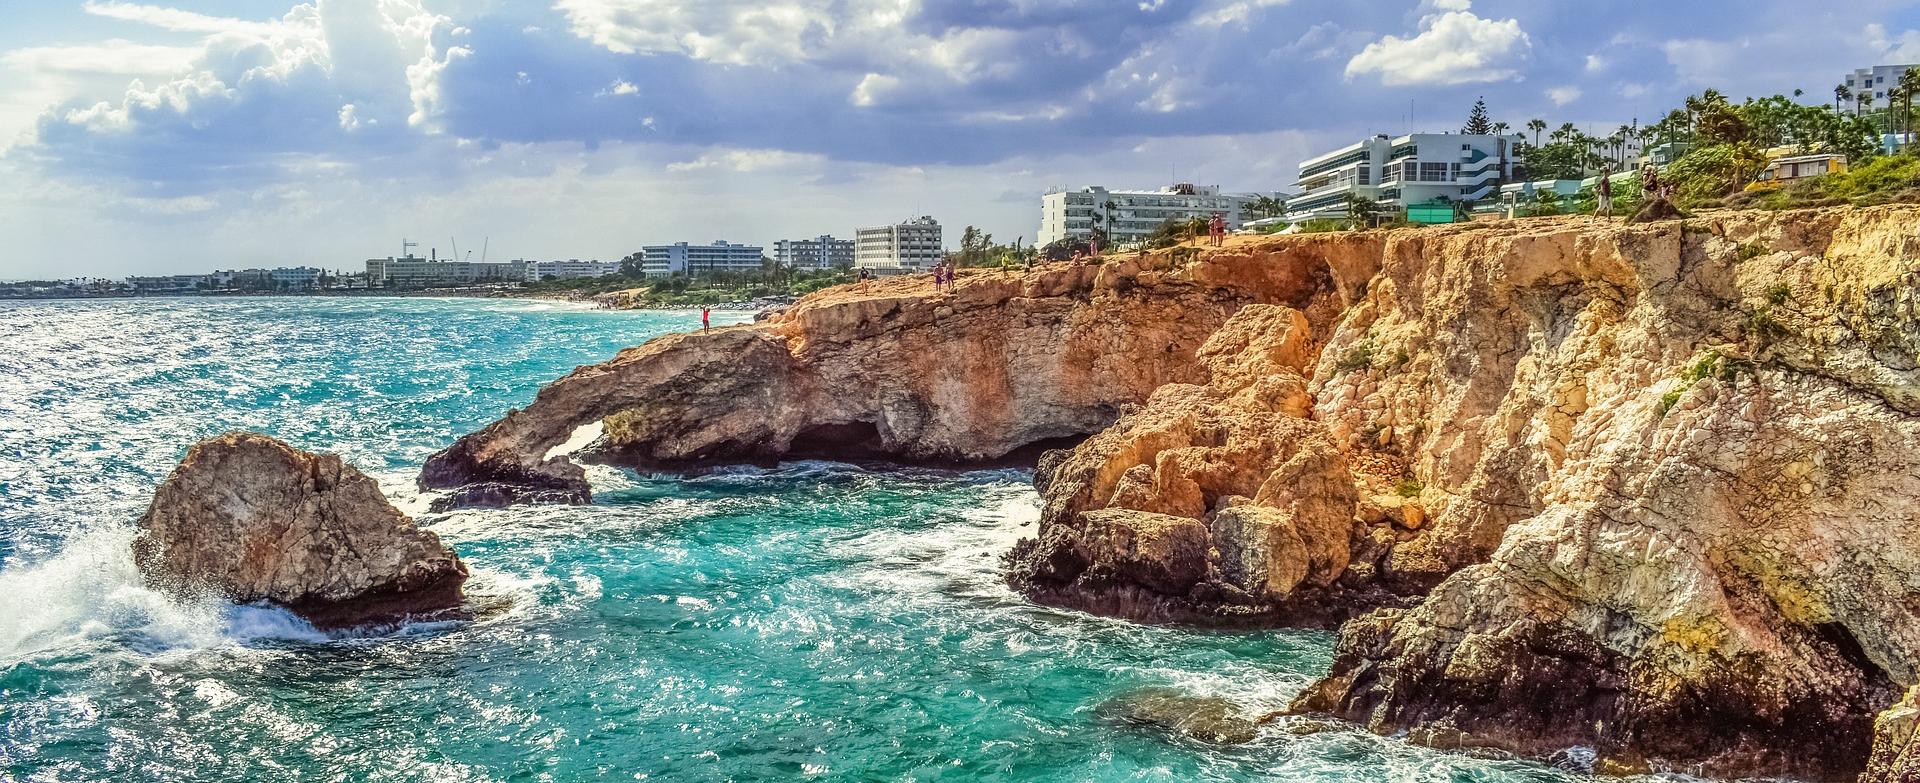 Траст на Кипре